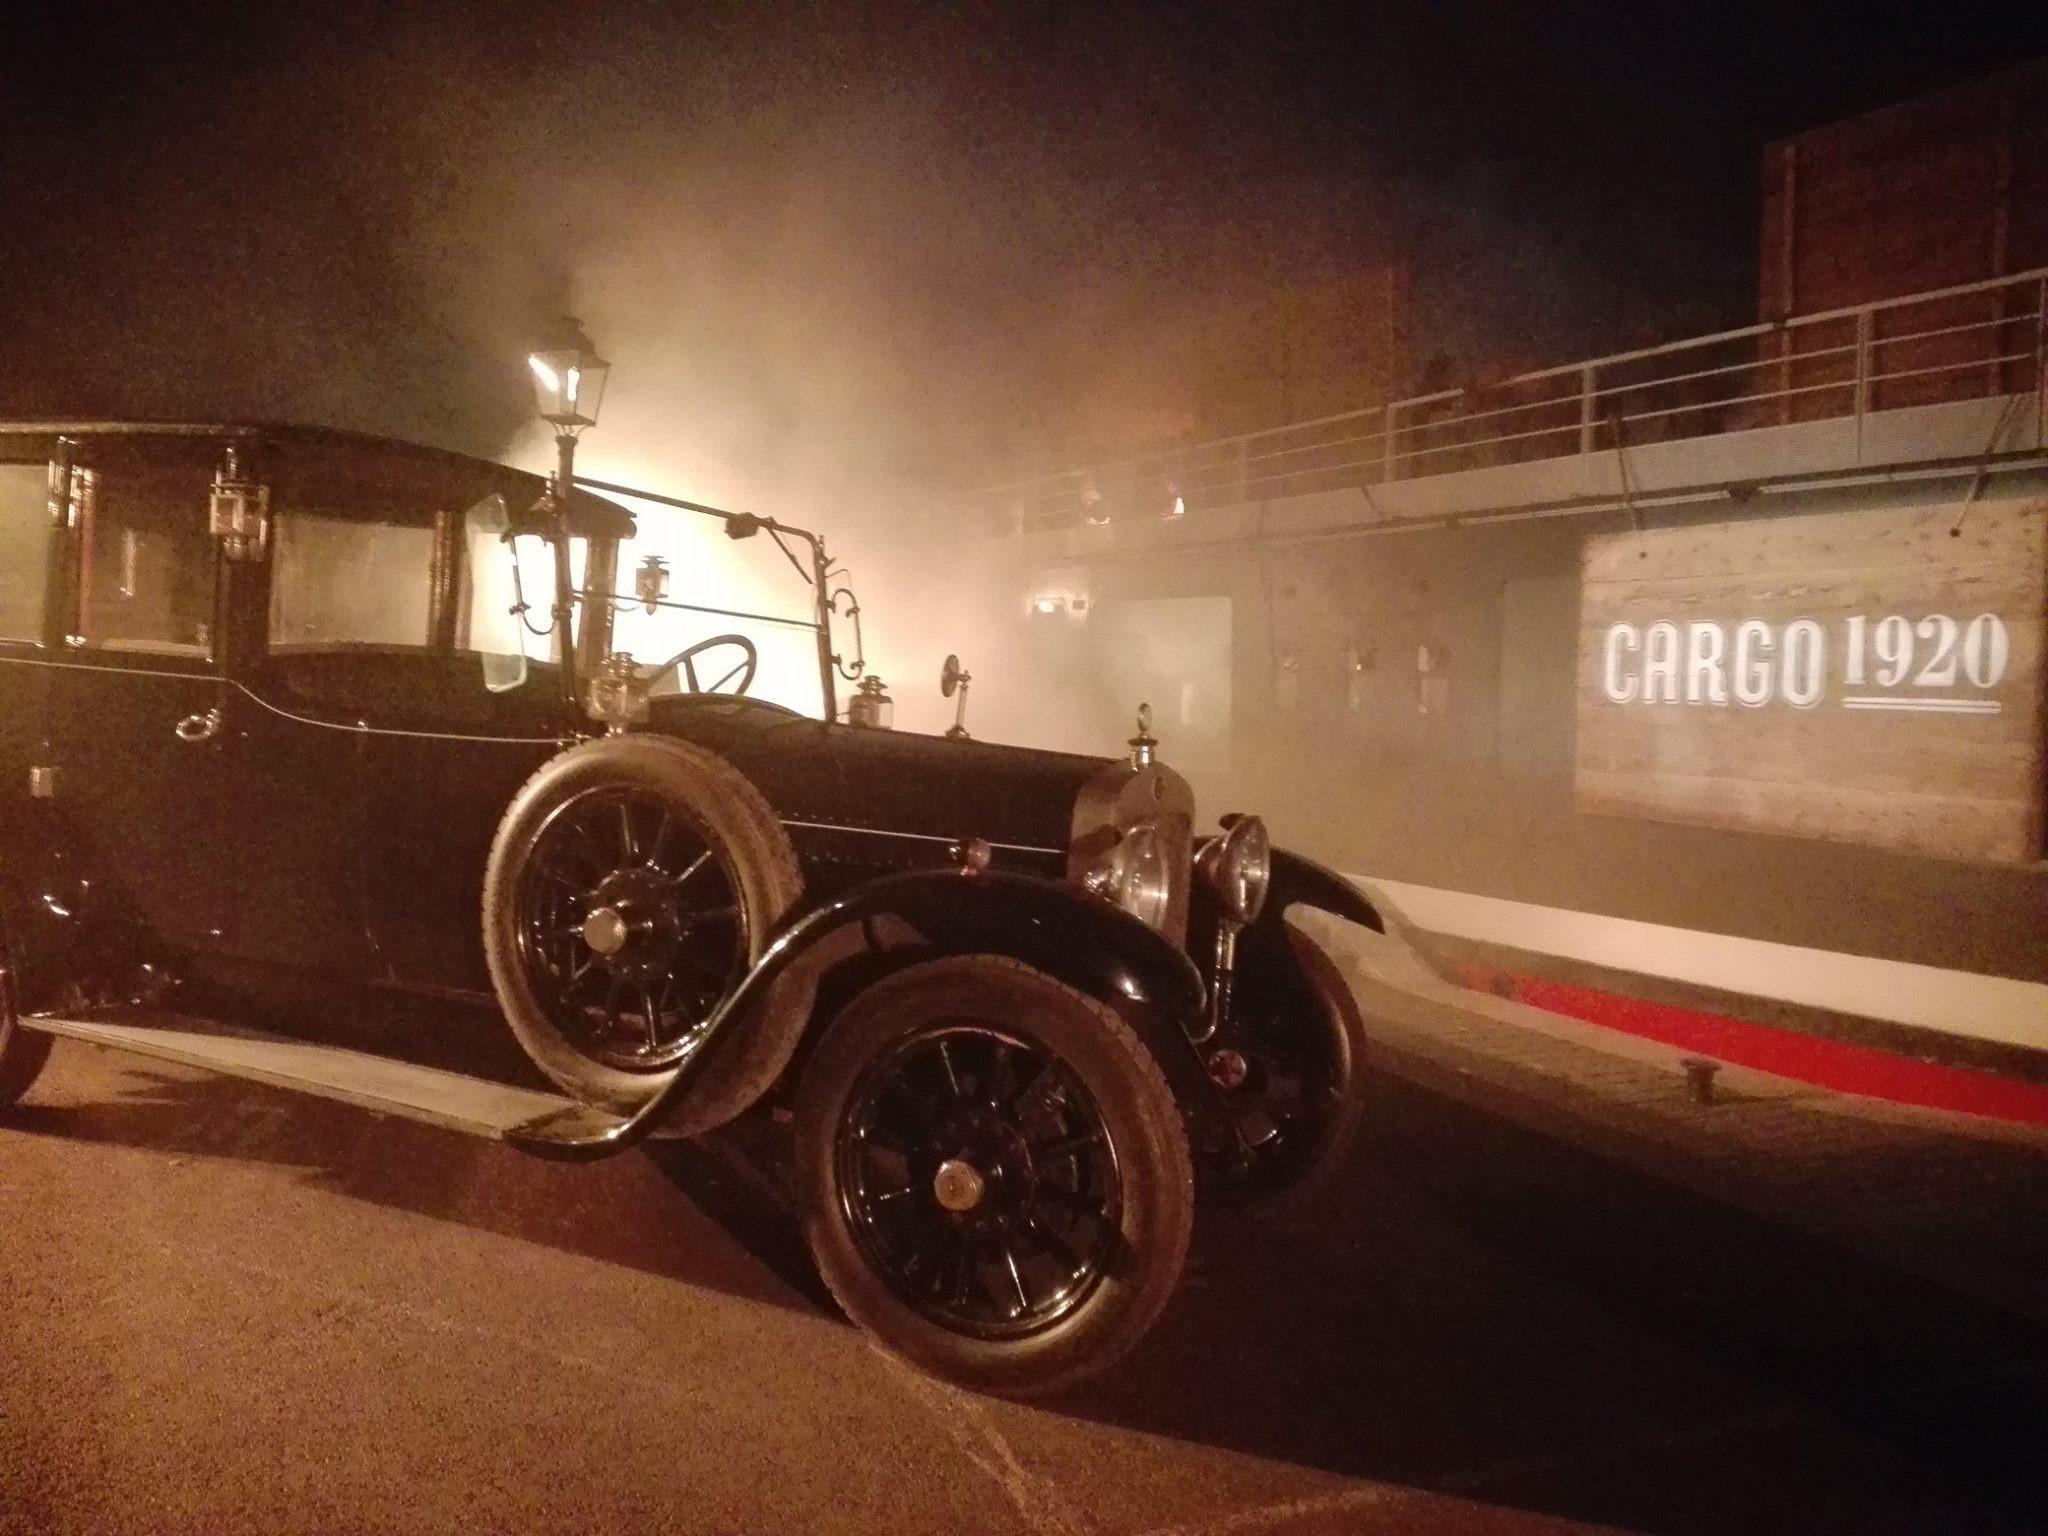 Cargo 1920 - Whisky J&B